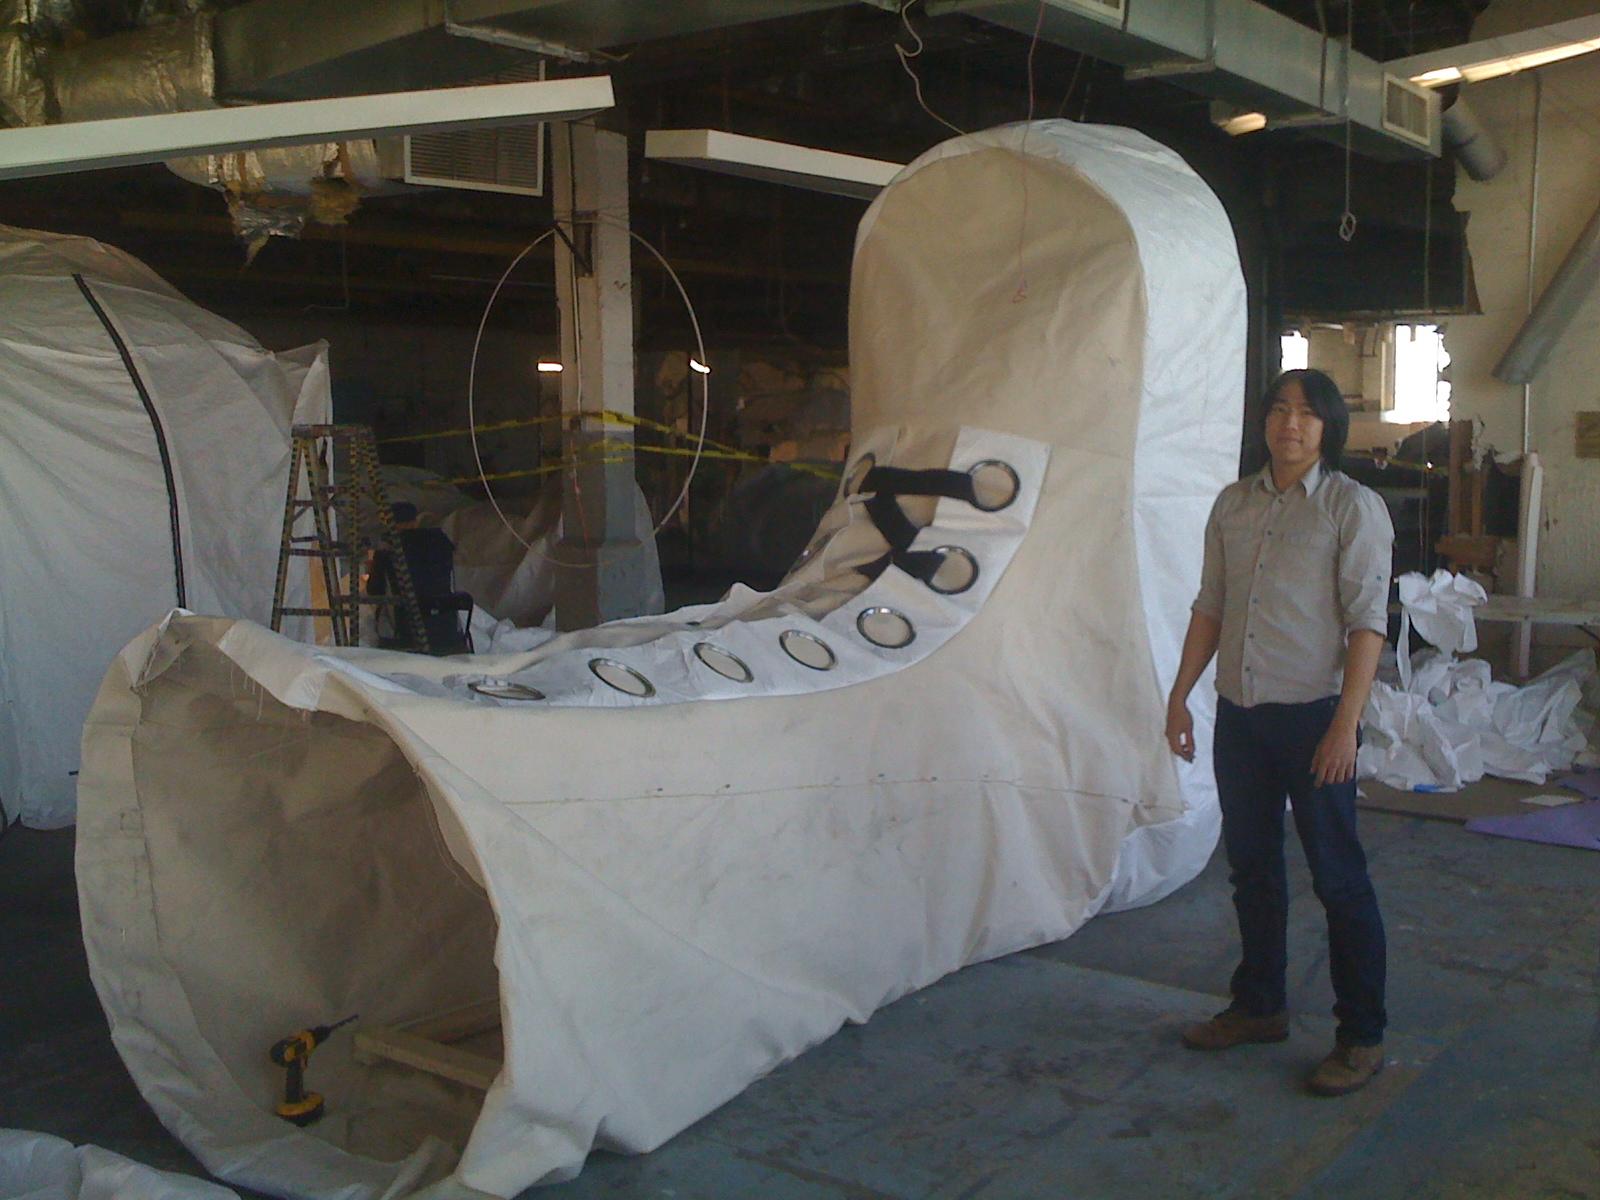 Tomaszewski's Space Suit Tent